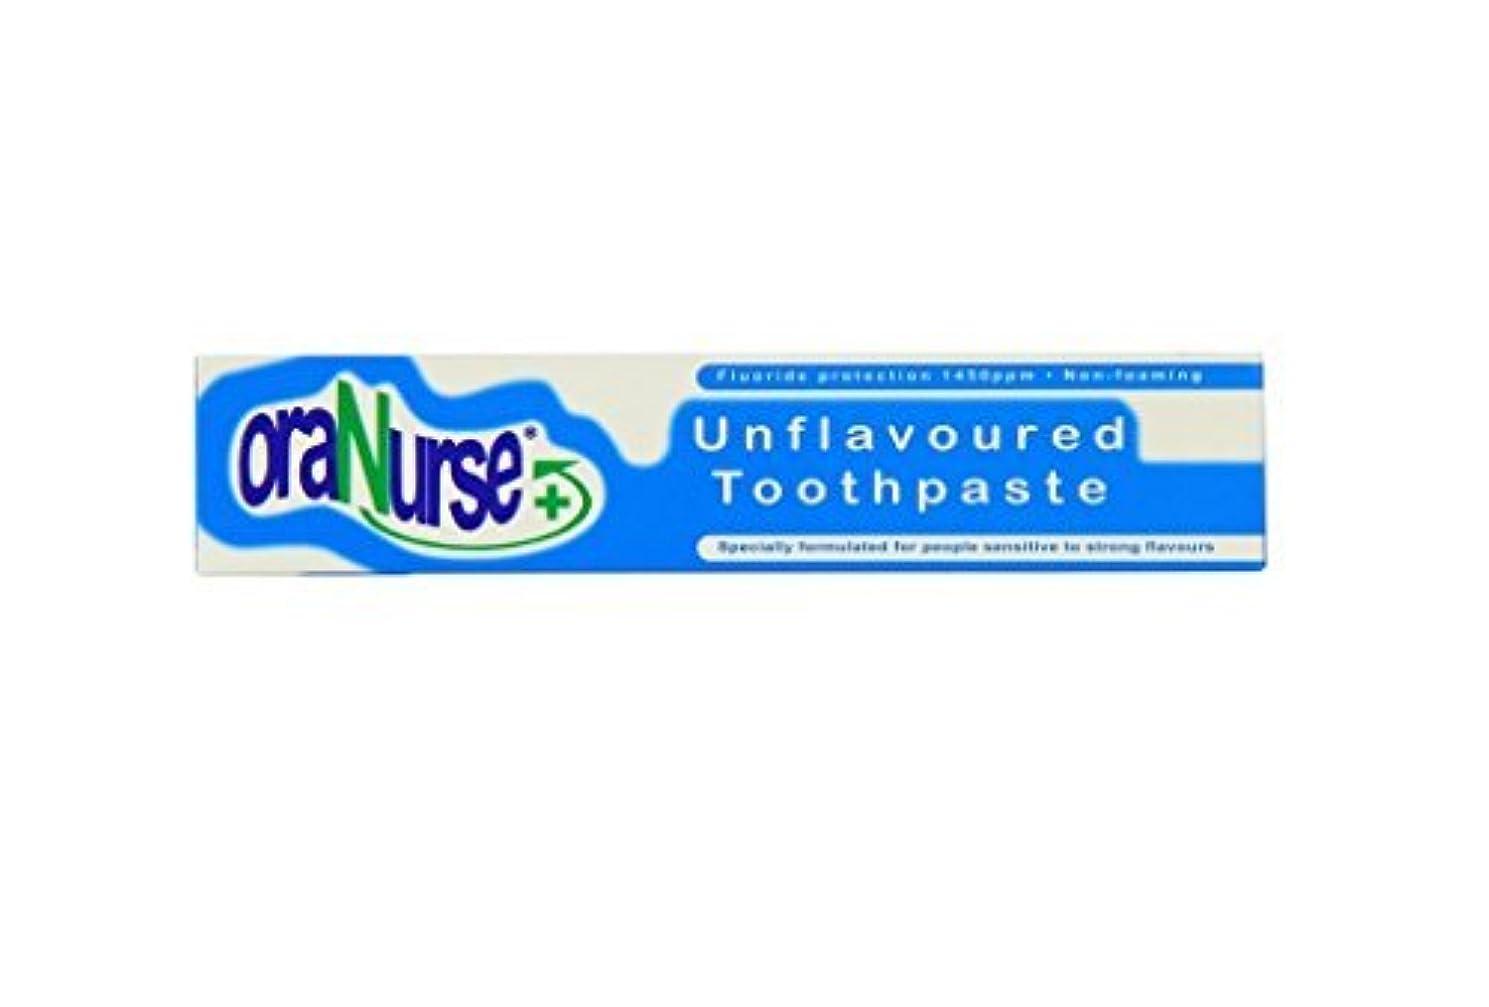 啓発する評判陰気Oranurse Toothpaste 50ml Unflavoured 1450ppm Fluoride by Oranurse